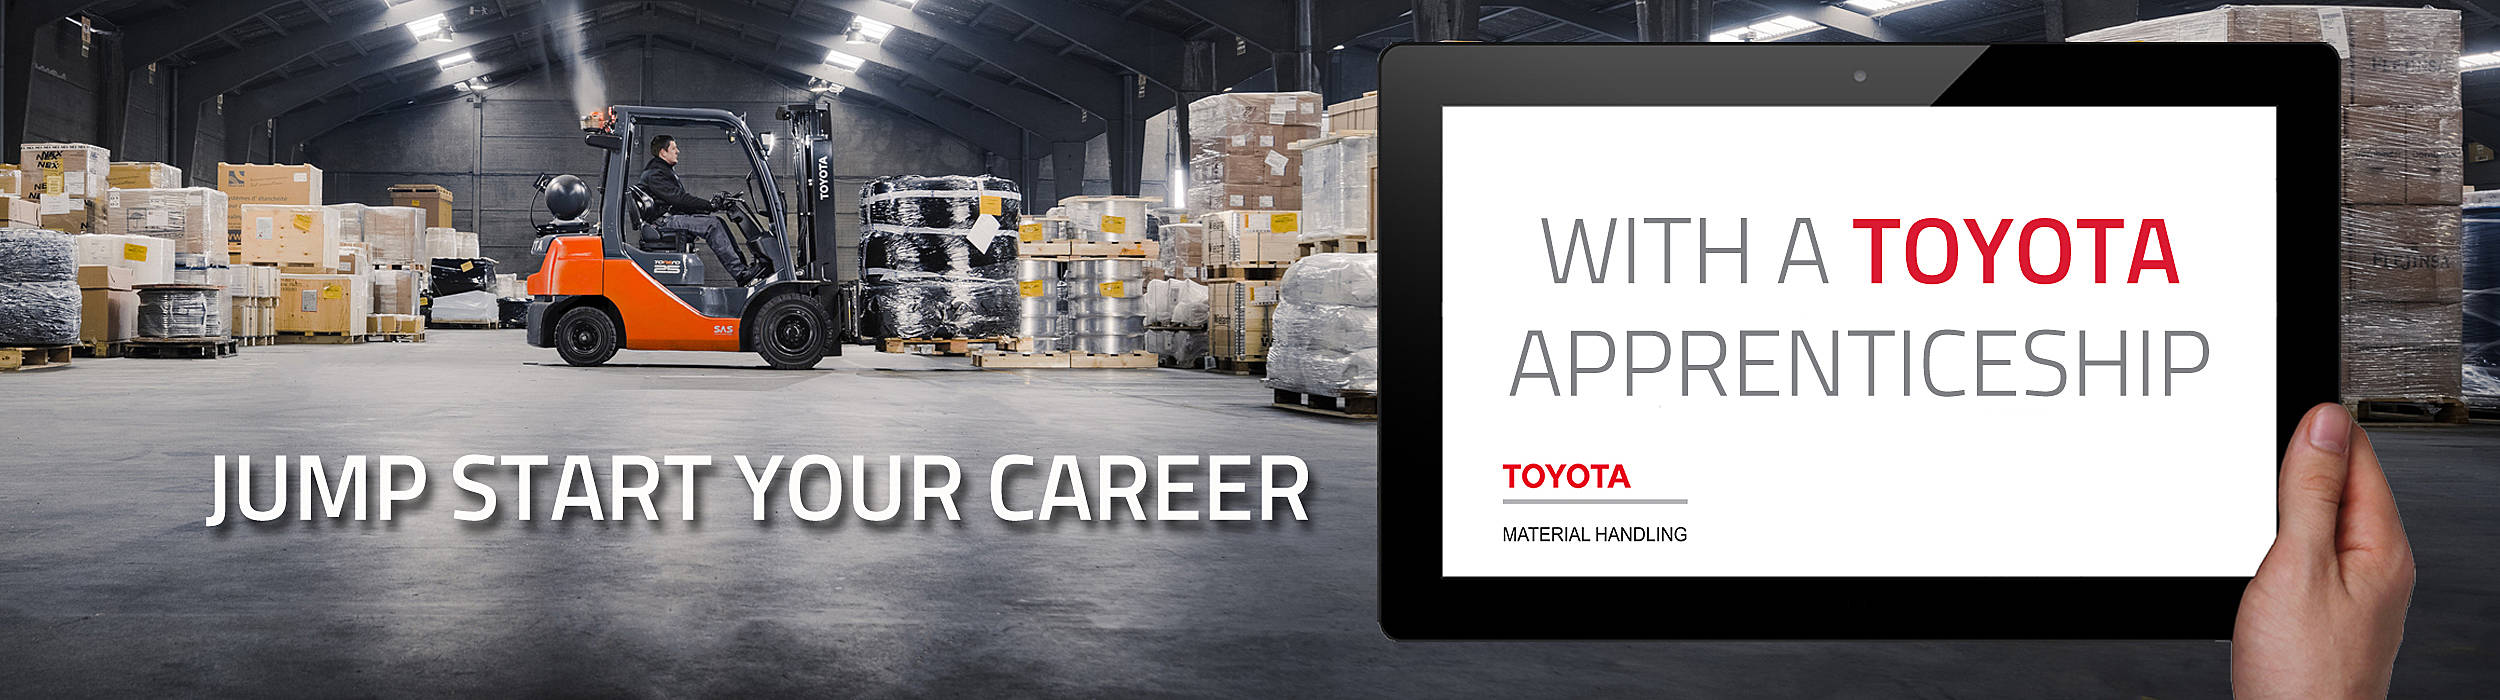 Toyota apprenticeship